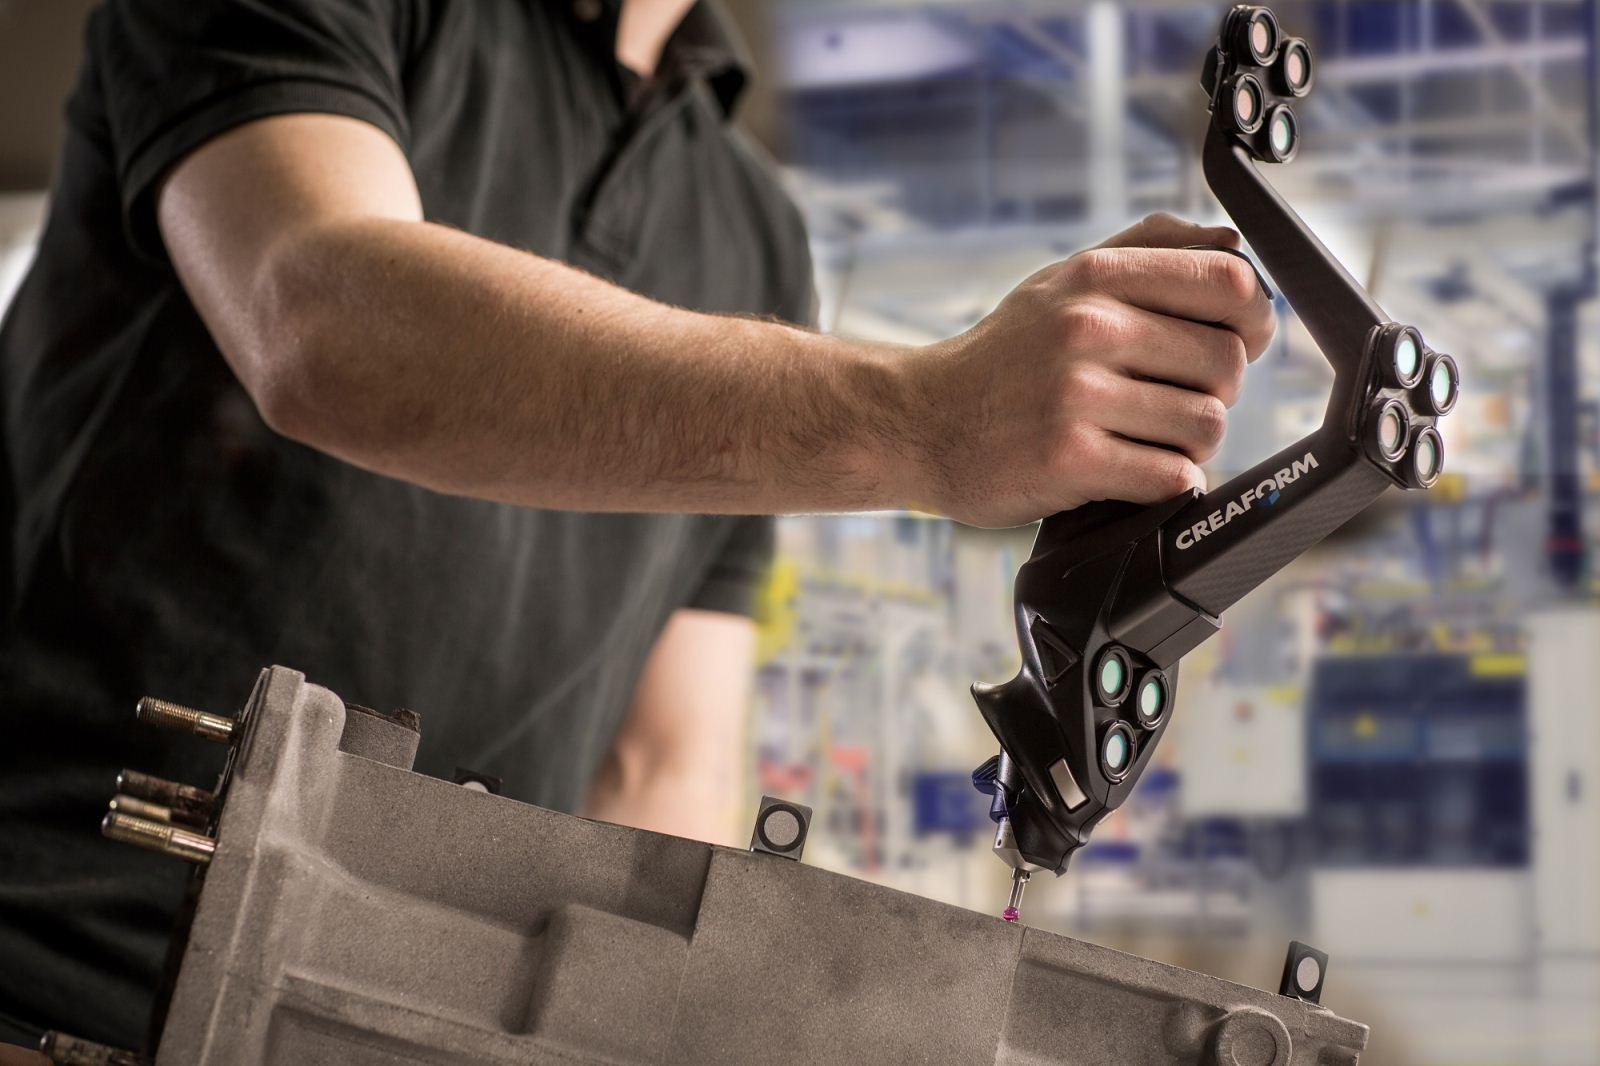 Creaform 推出专为应对现代化车间的各种质量控制挑战而重新打造的全新便携式 HandyPROBE Next